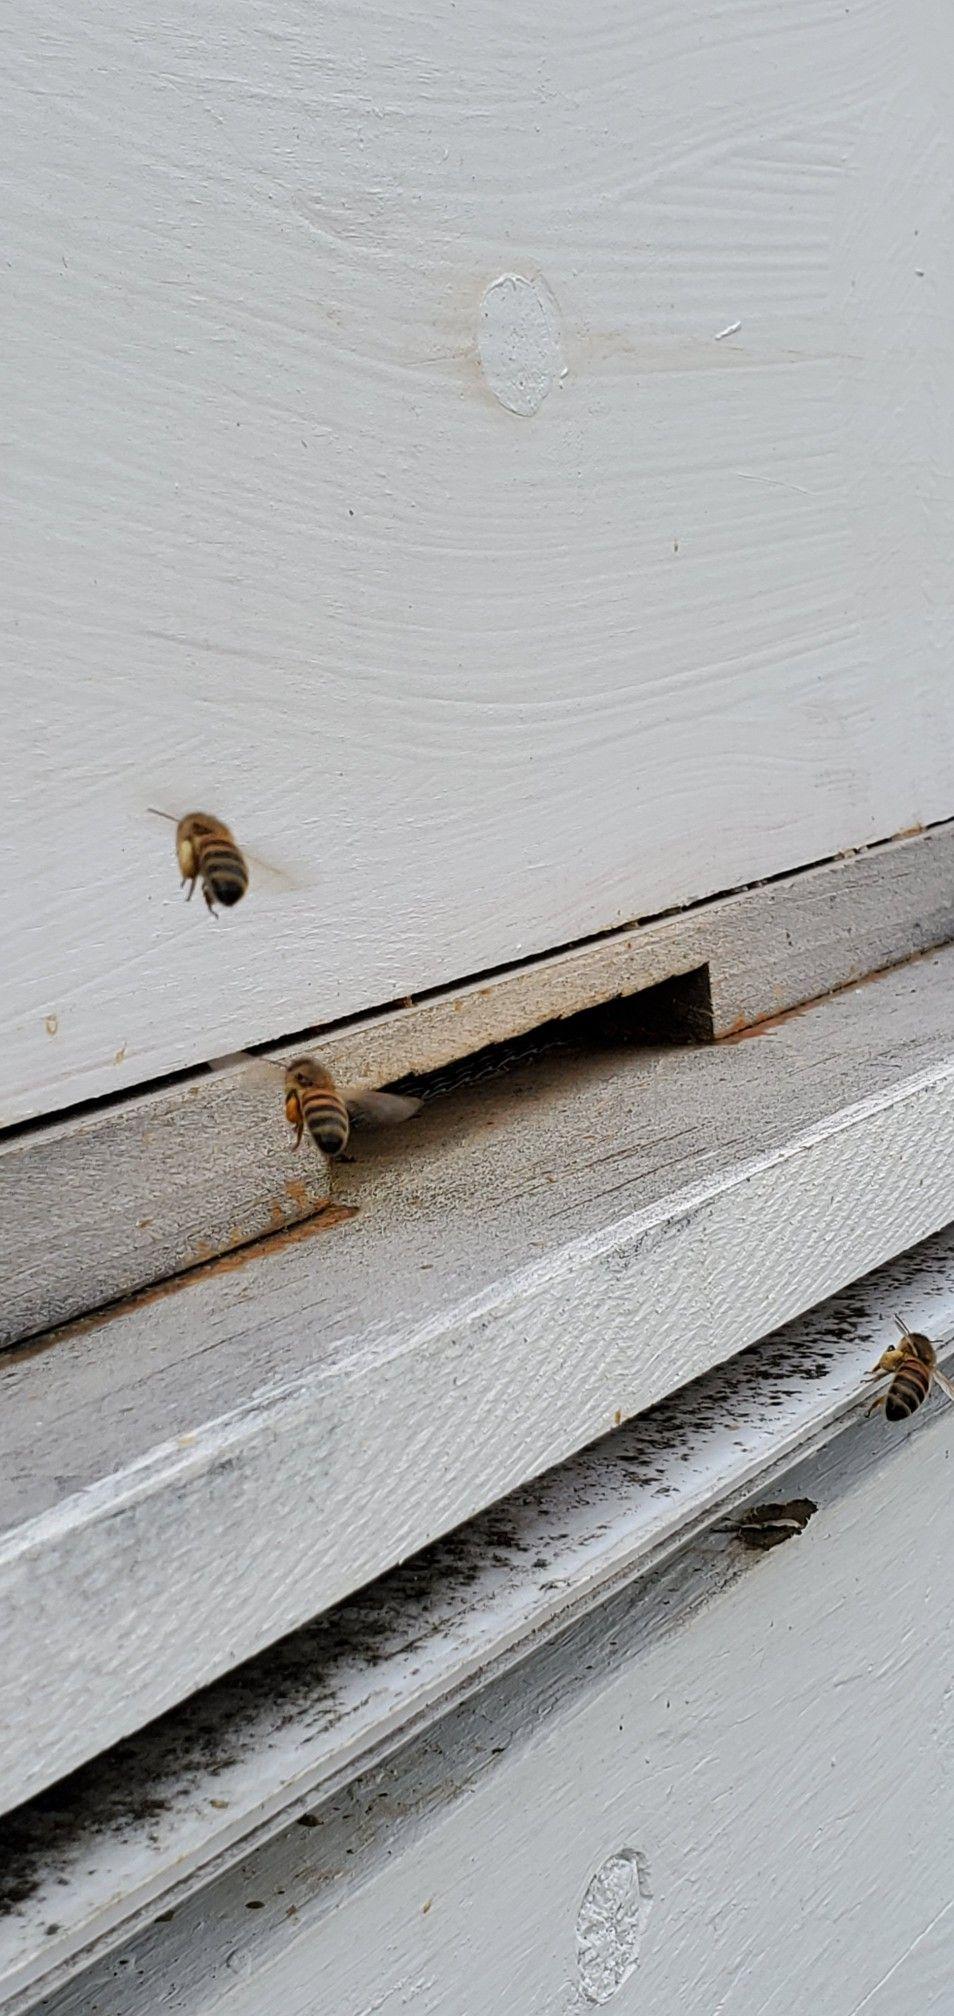 Pin On Beekeeping